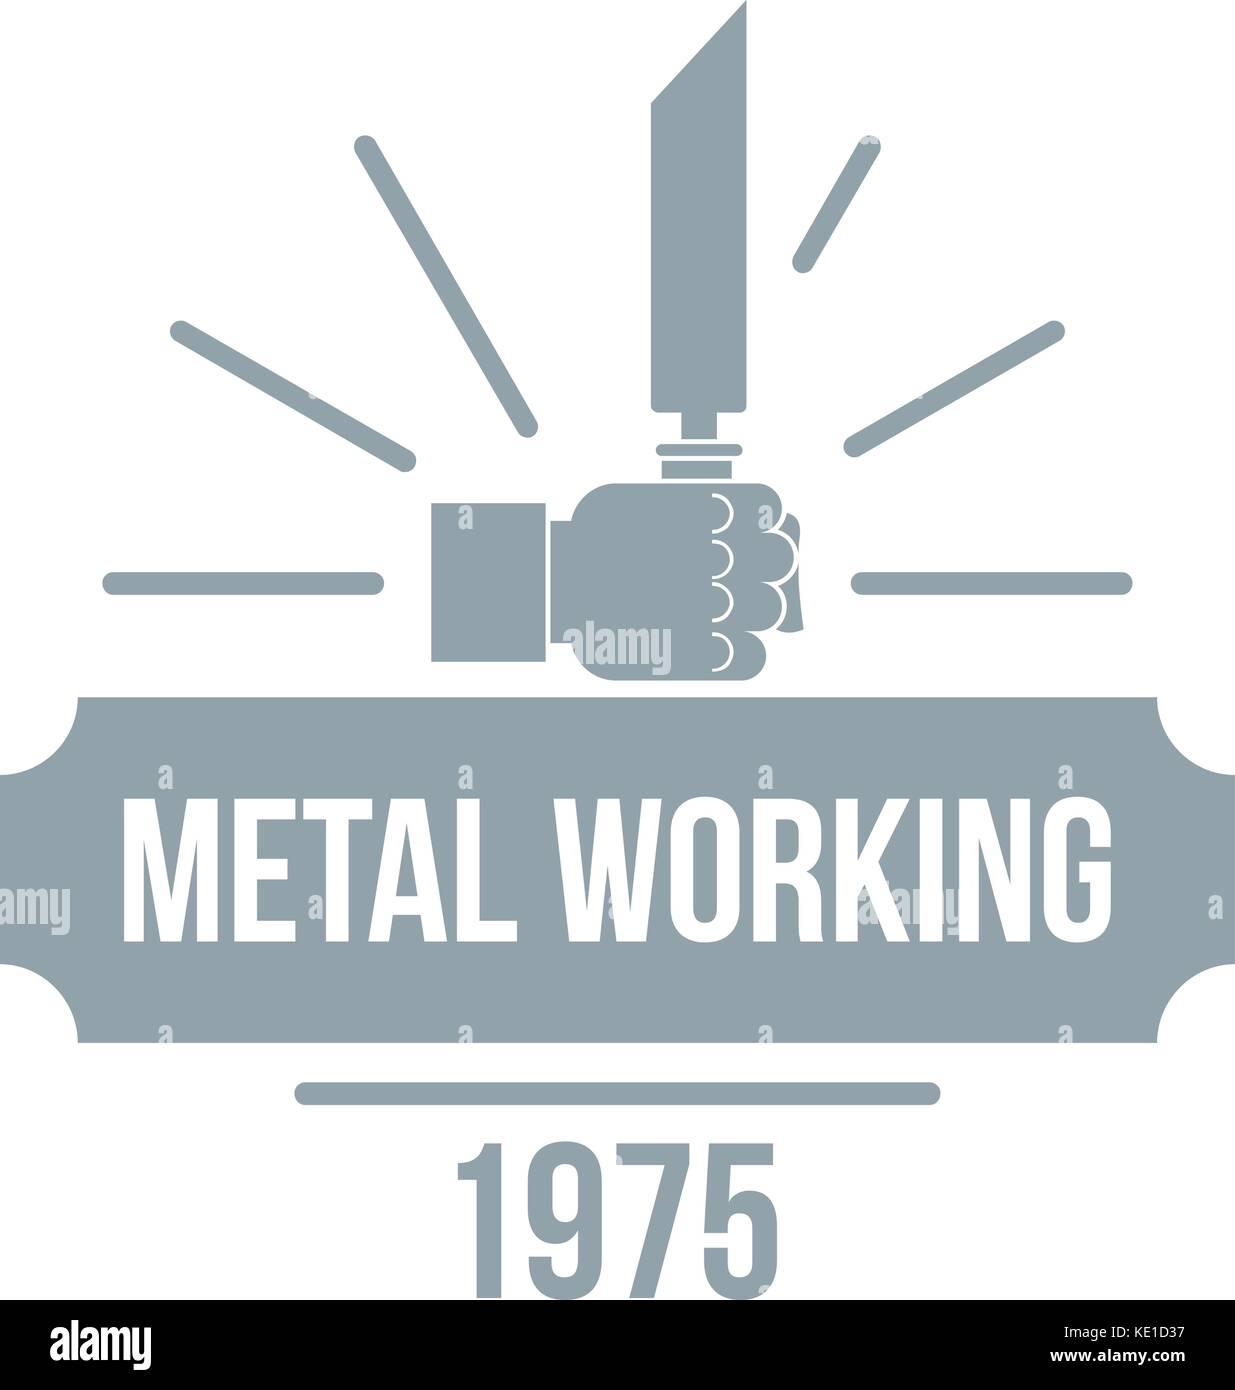 Metal working logo, vintage style Stock Vector